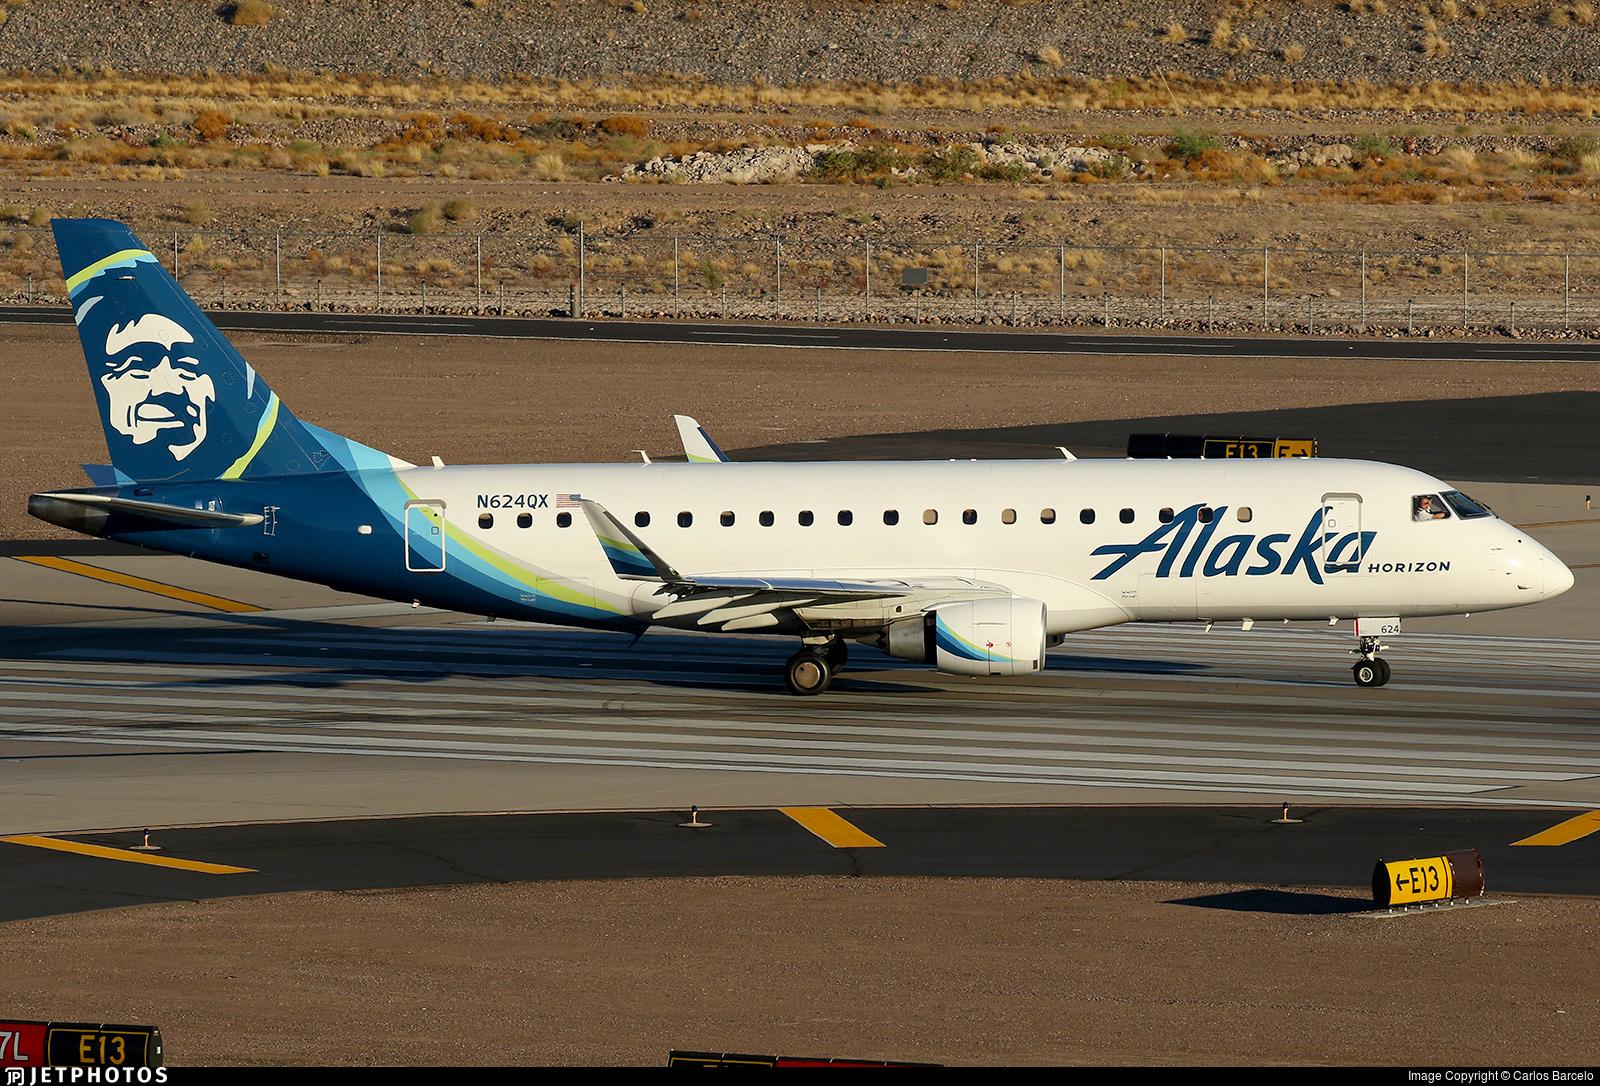 N624QX - Embraer 170-200LR - Alaska Airlines (Horizon Air)